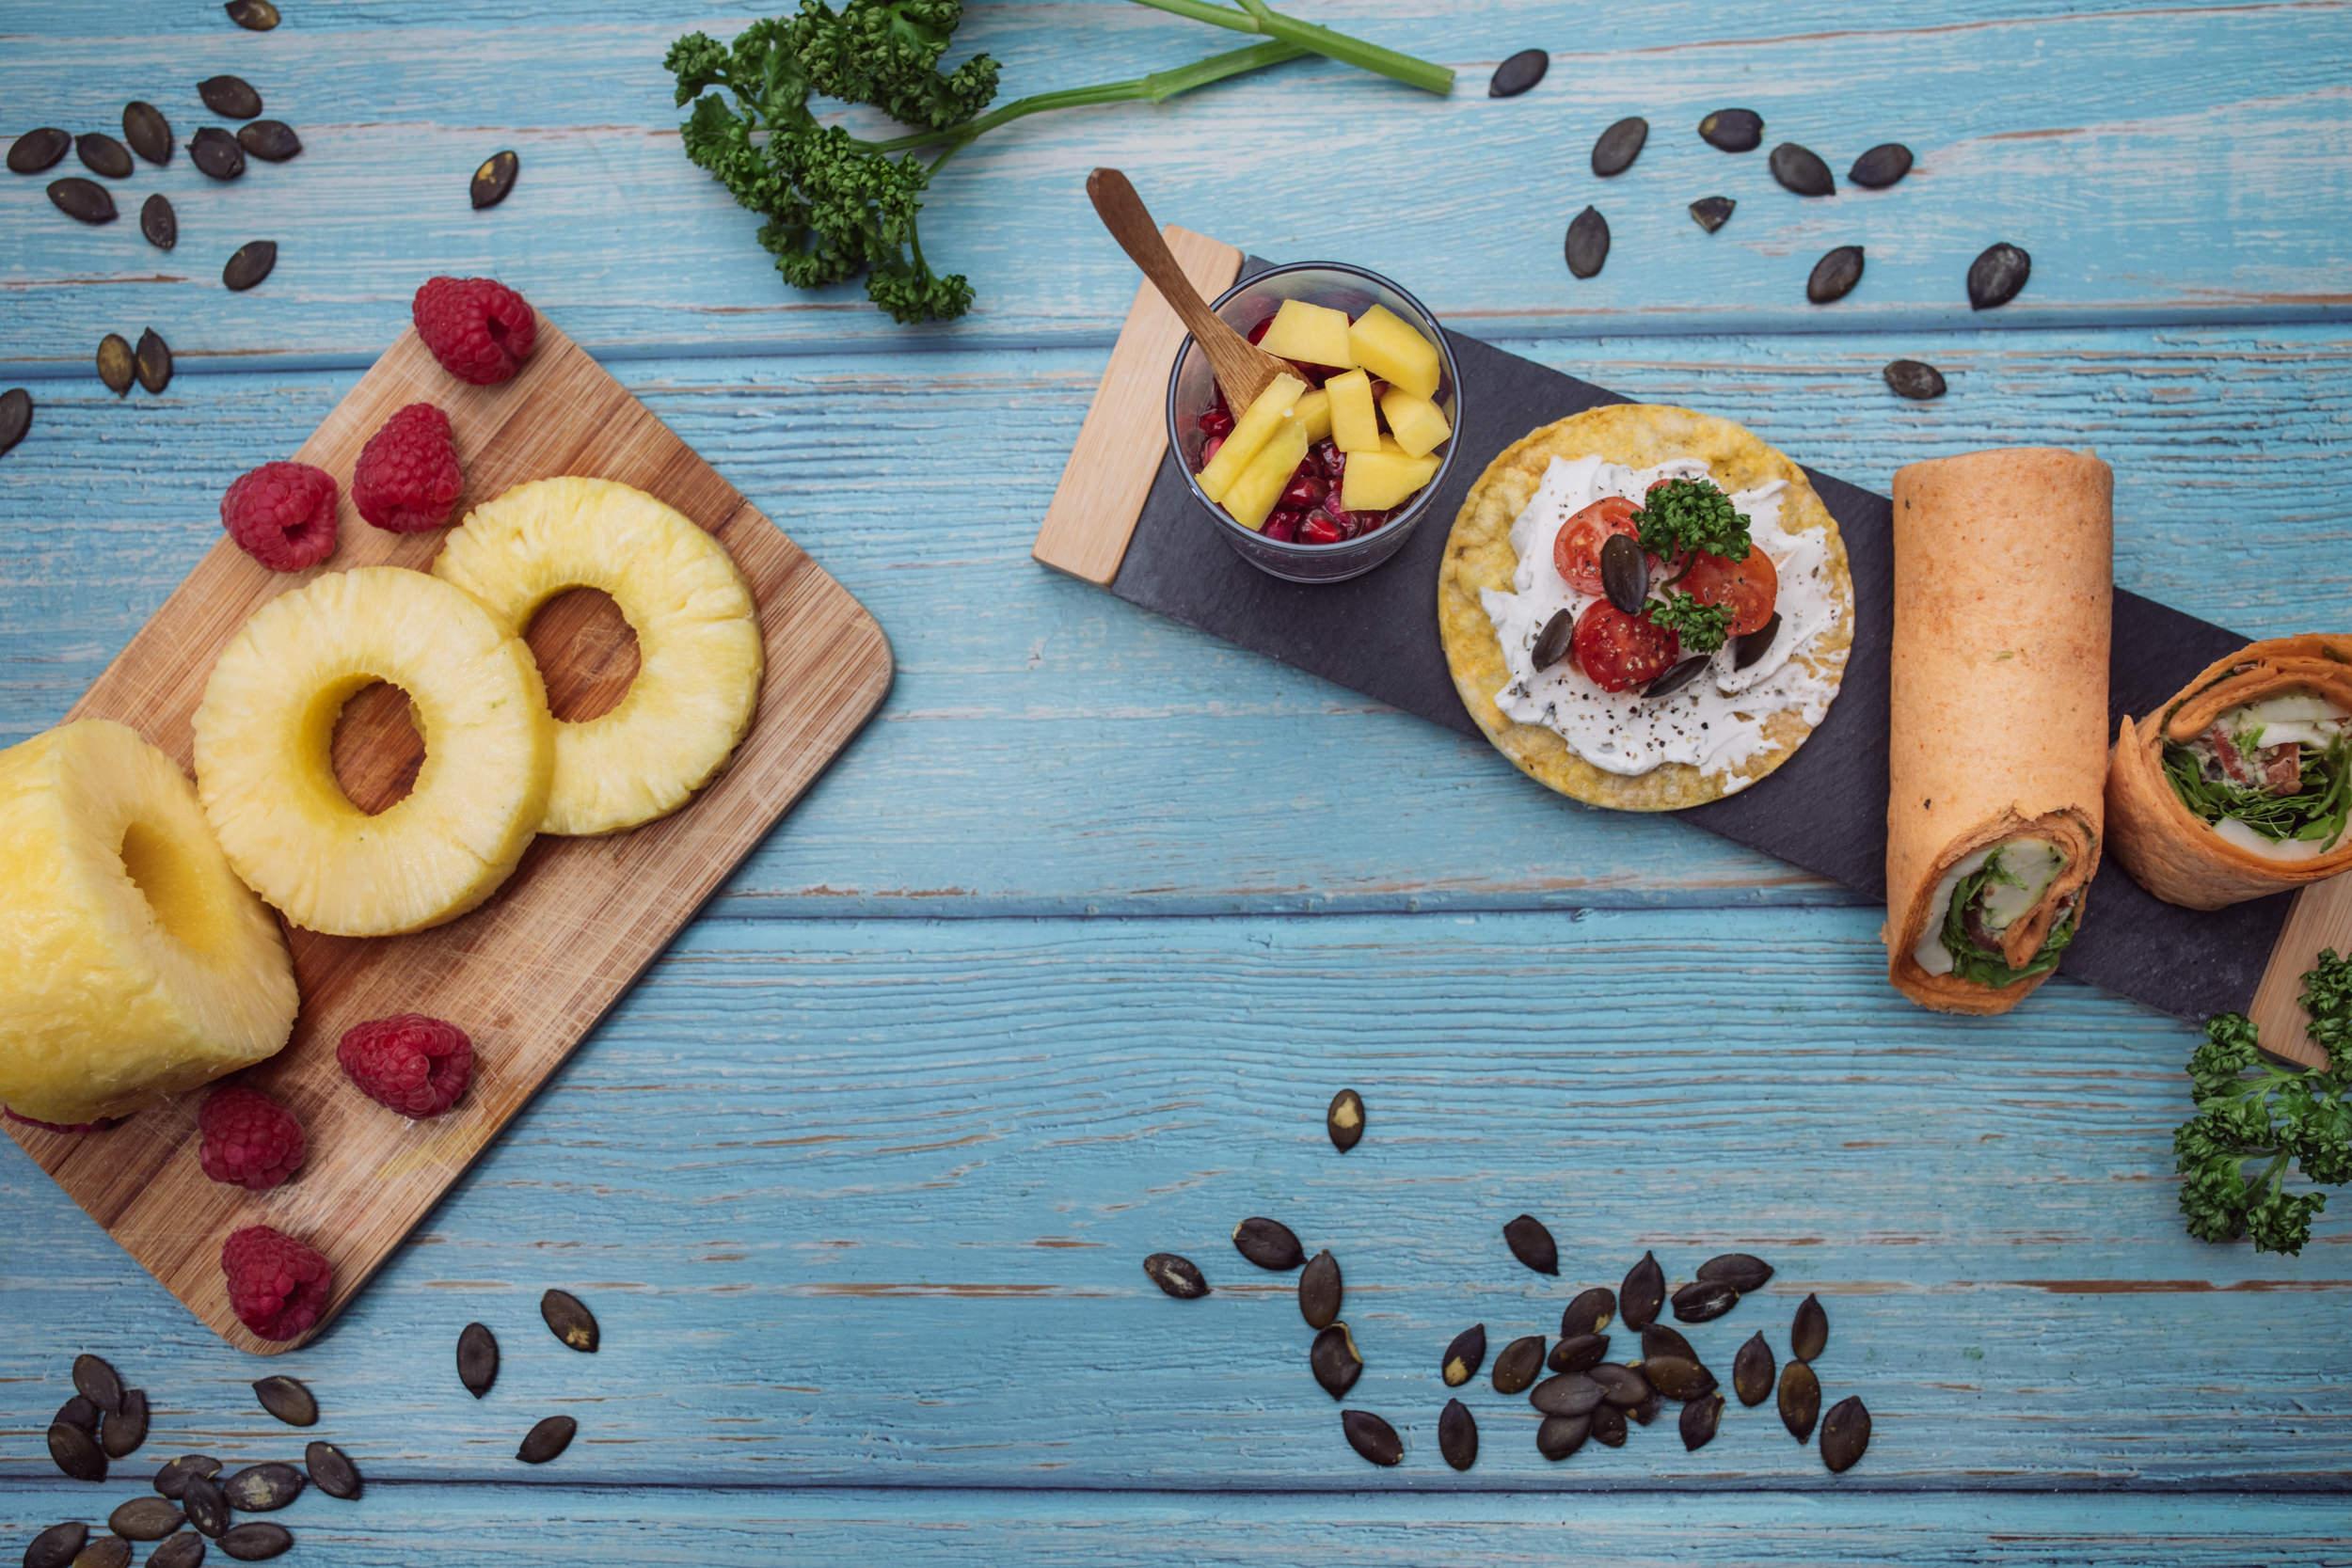 FOOD STUDIO PATRICKSCHMETZER ESSEN 3  Food